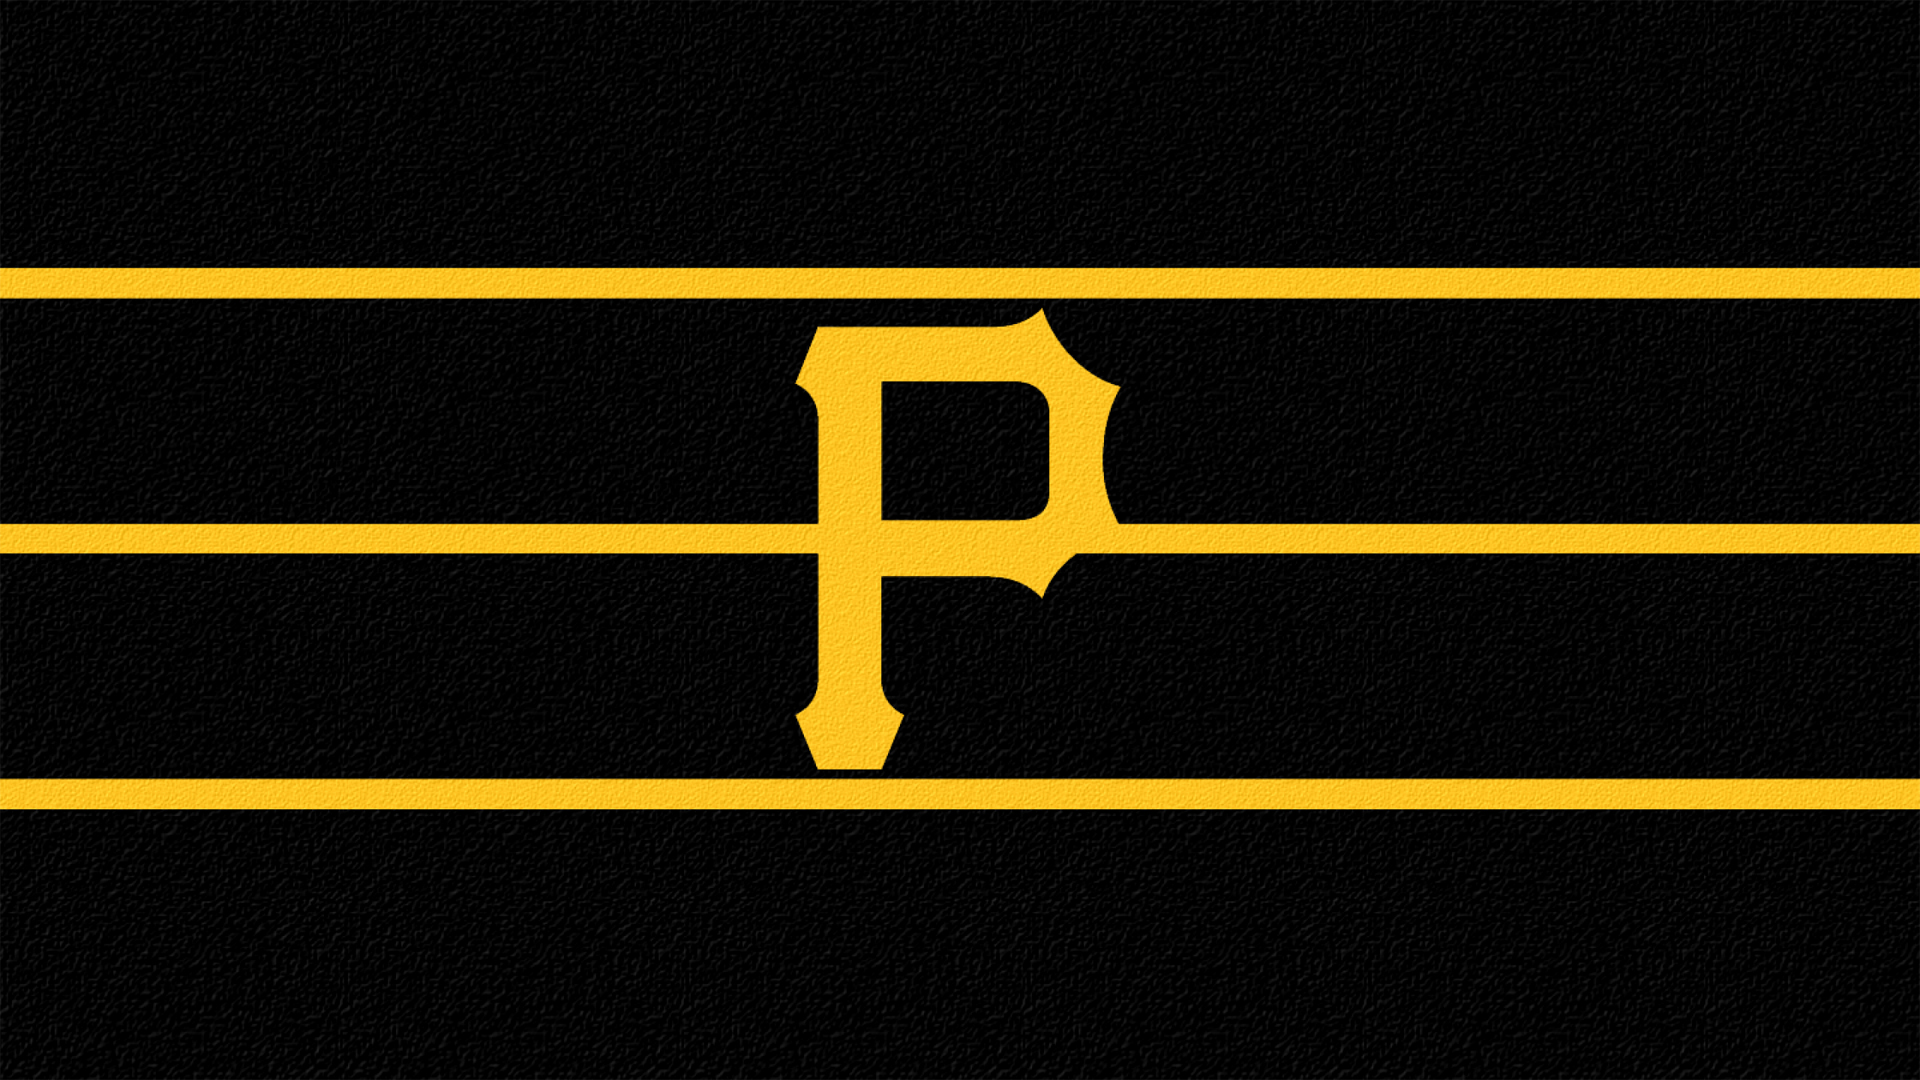 Happy Easter Wallpaper 3d Pittsburgh Pirates Logo Wallpapers Hd Pixelstalk Net